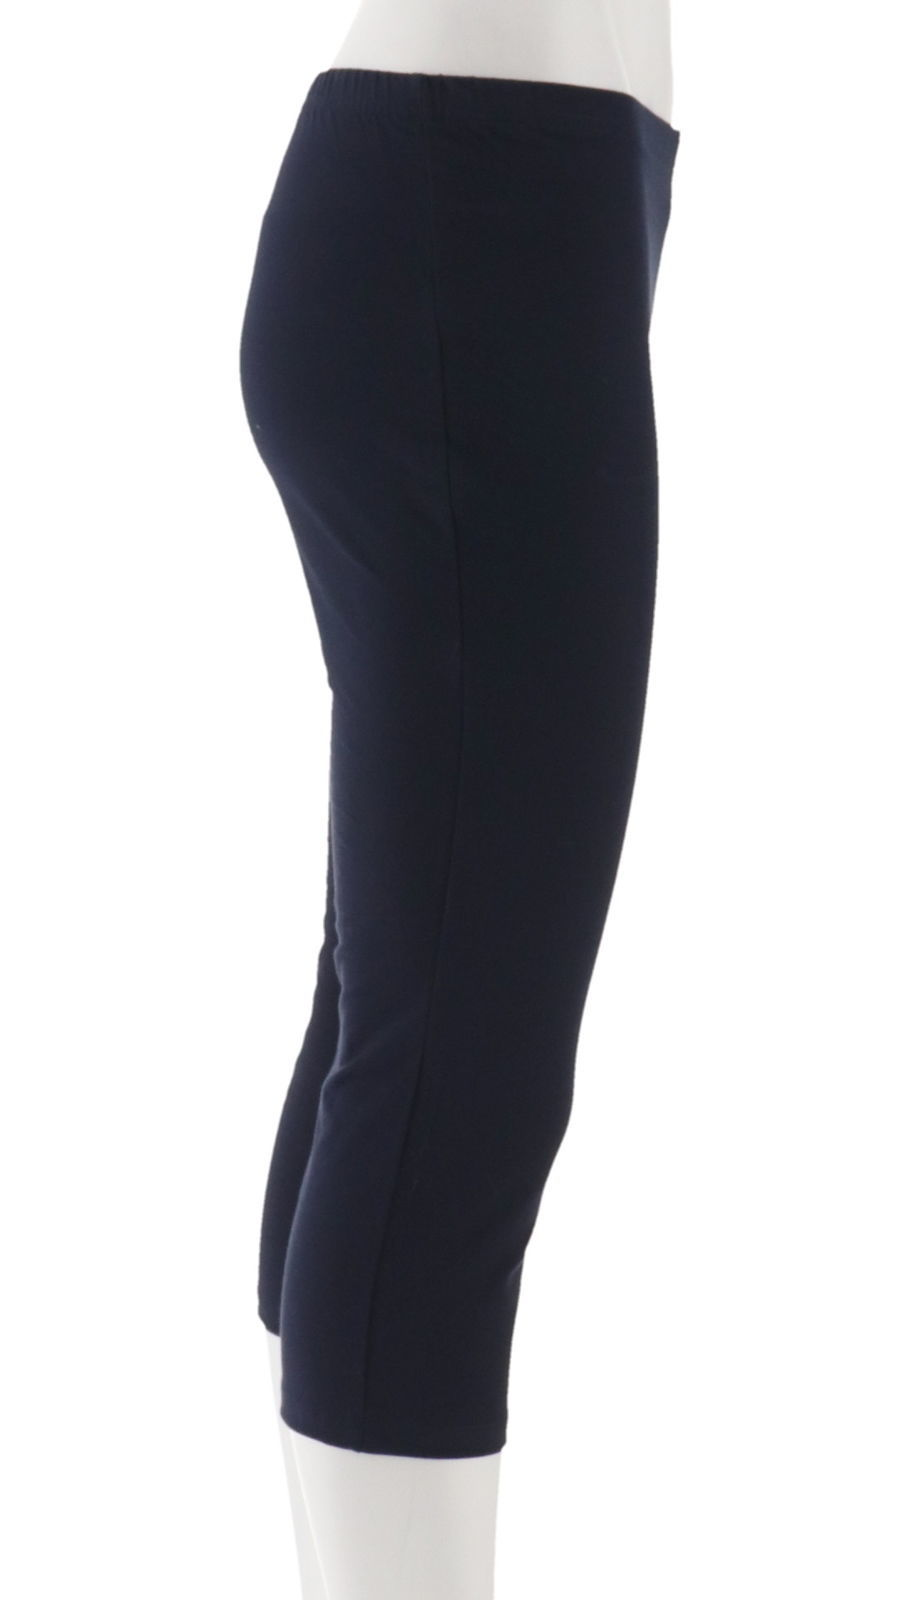 Women with Control Petite Set 2 Knit Chic Crop Pants Black Navy PXXS NEW A252190